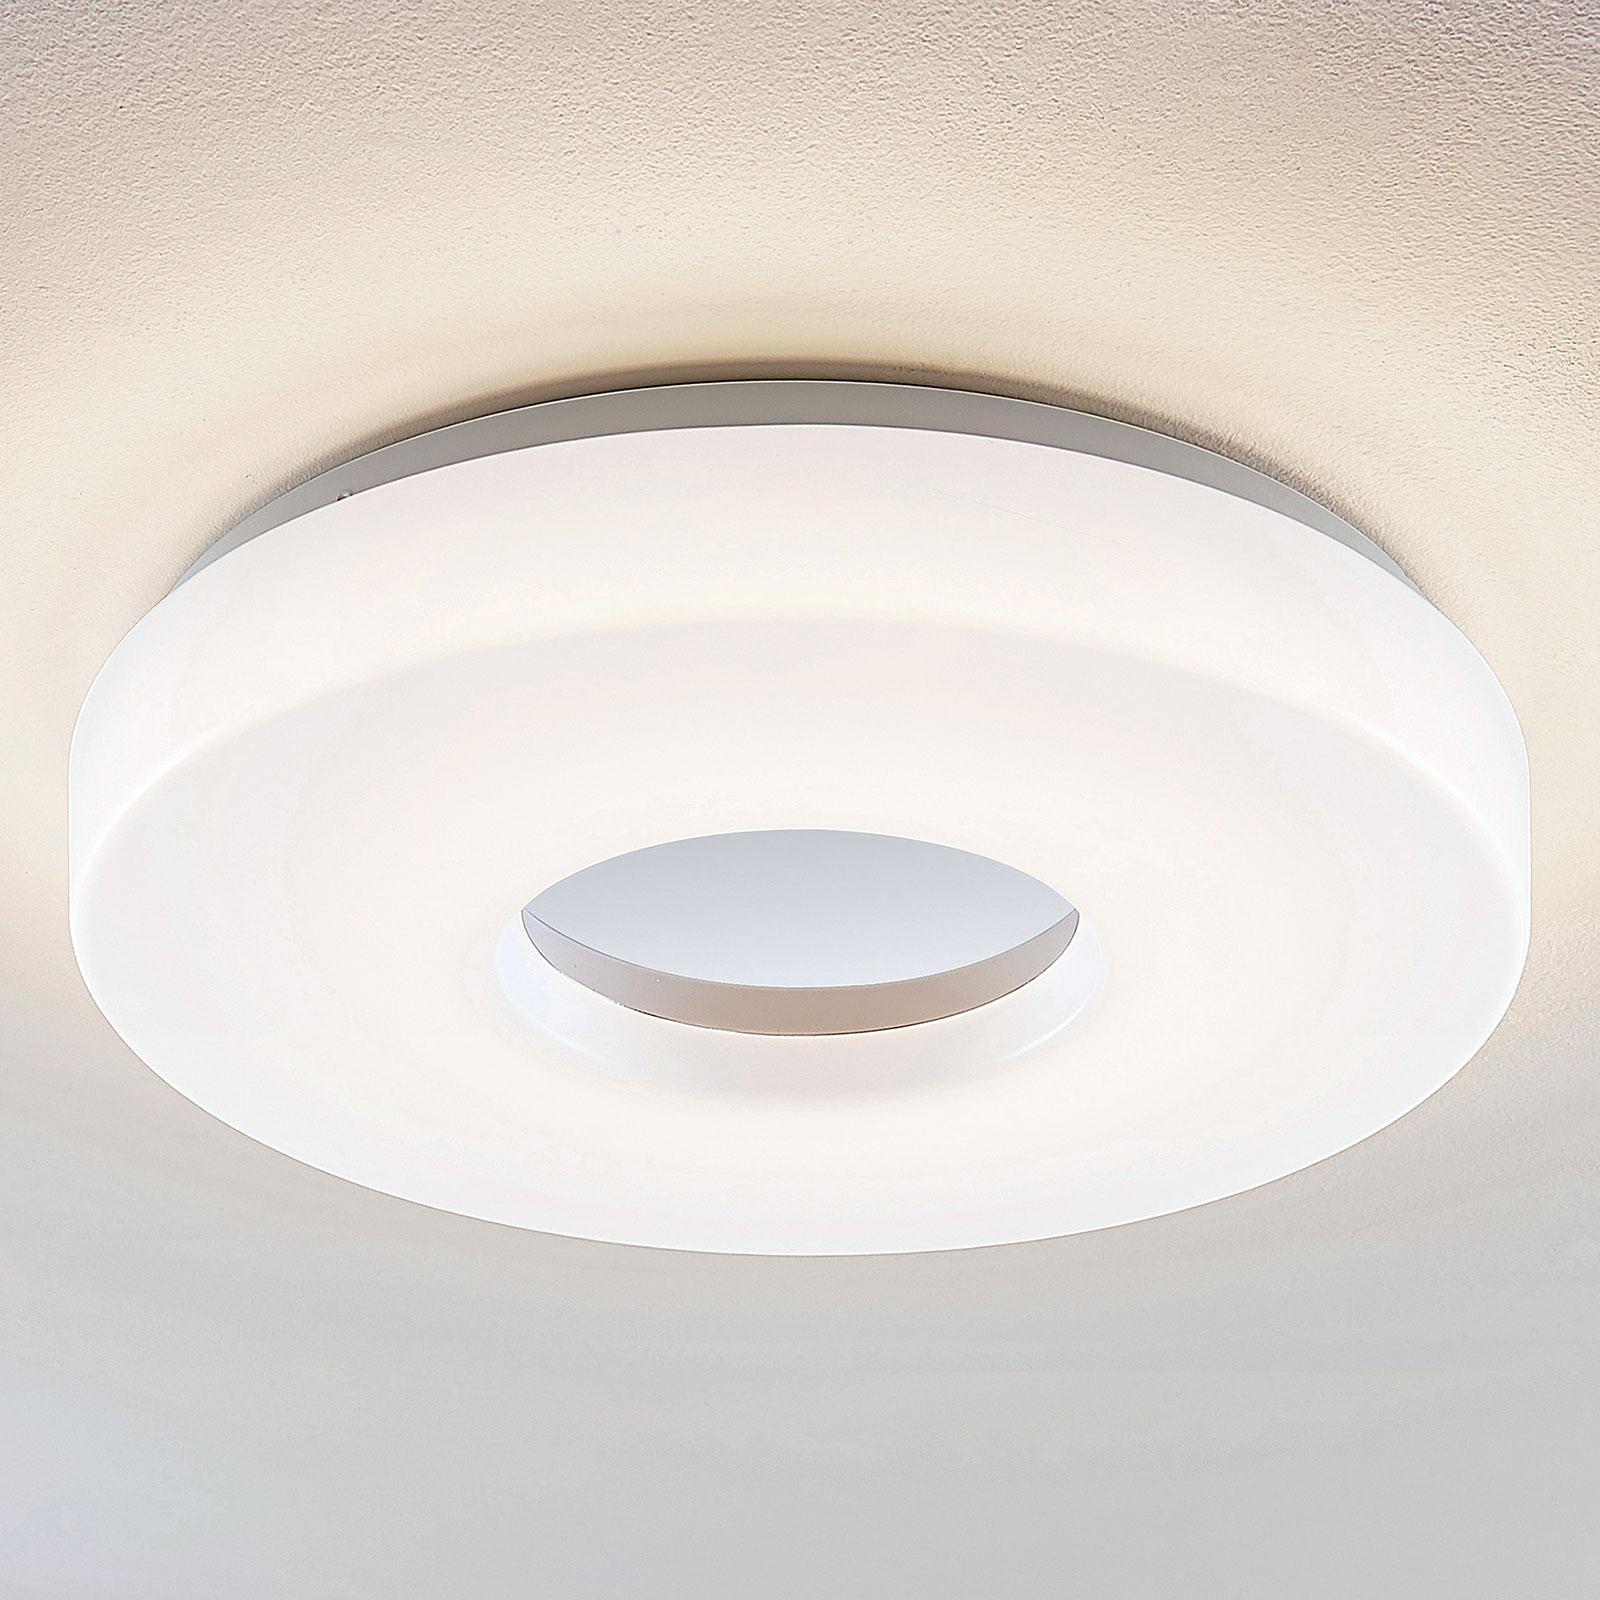 Lindby Florentina LED plafondlamp, ring, 41 cm